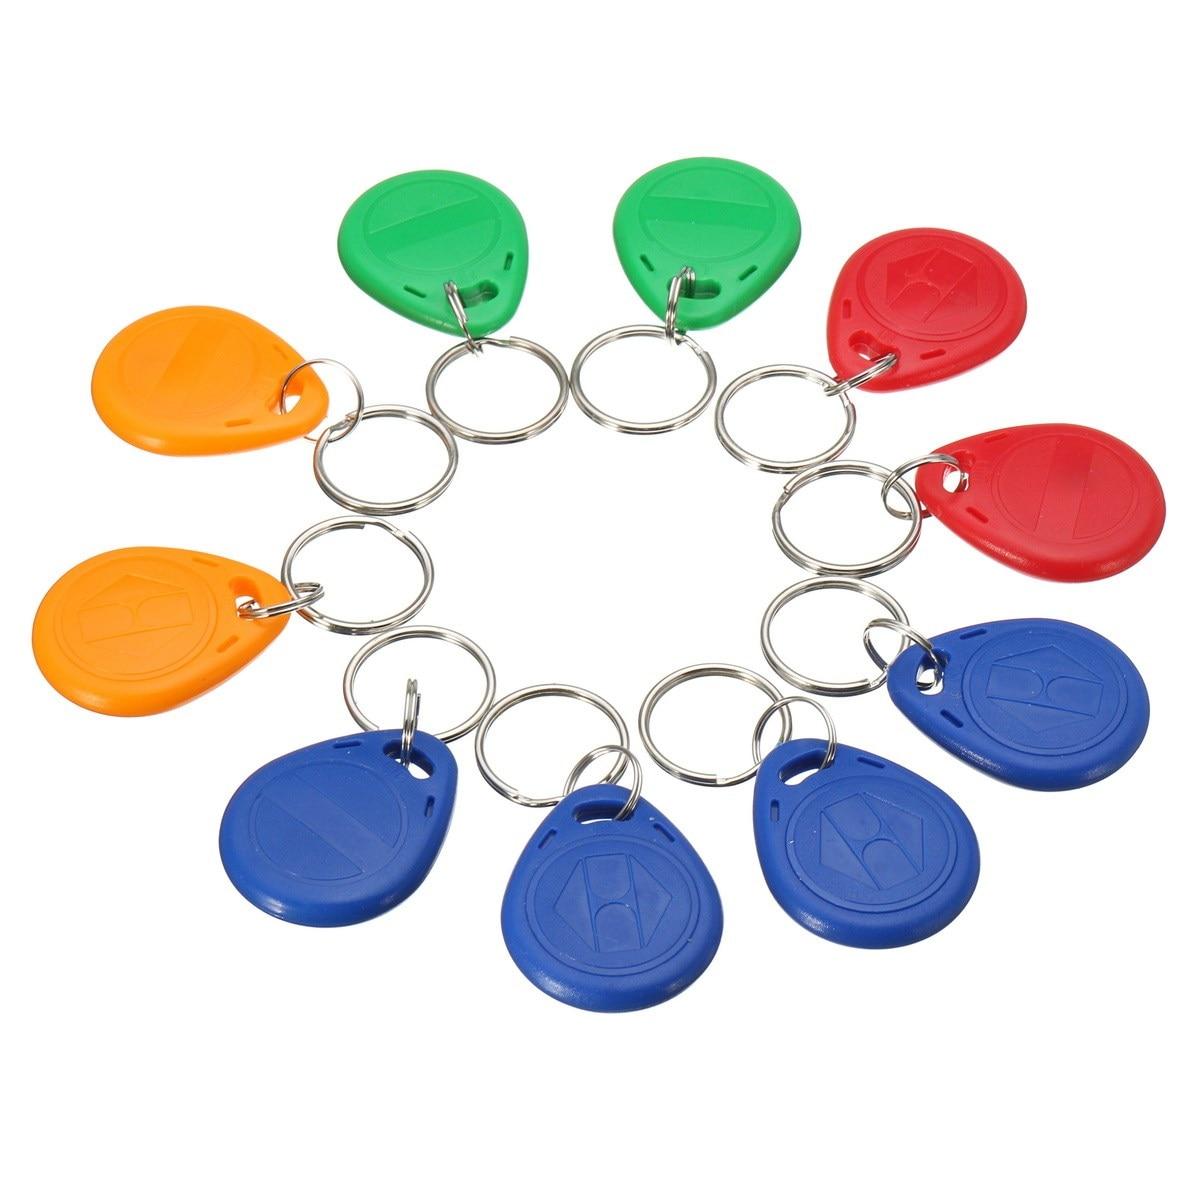 10pcs Handheld 125KHz RFID ID cards keyfob EM4305 access control card Tag